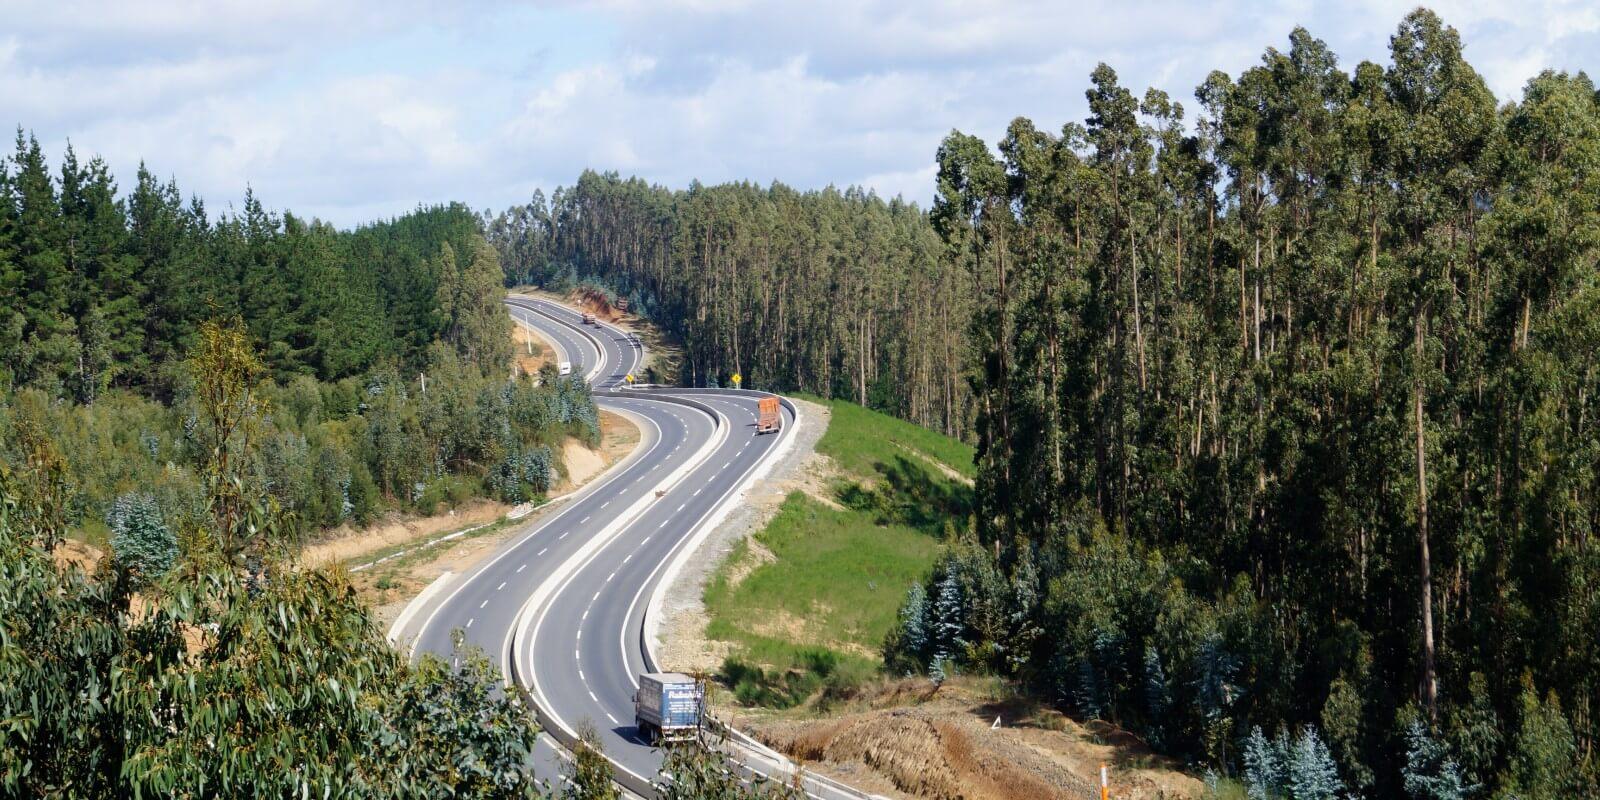 ACCIONA WINS HIGHWAY CONSTRUCTION IN NORTHERN PERU